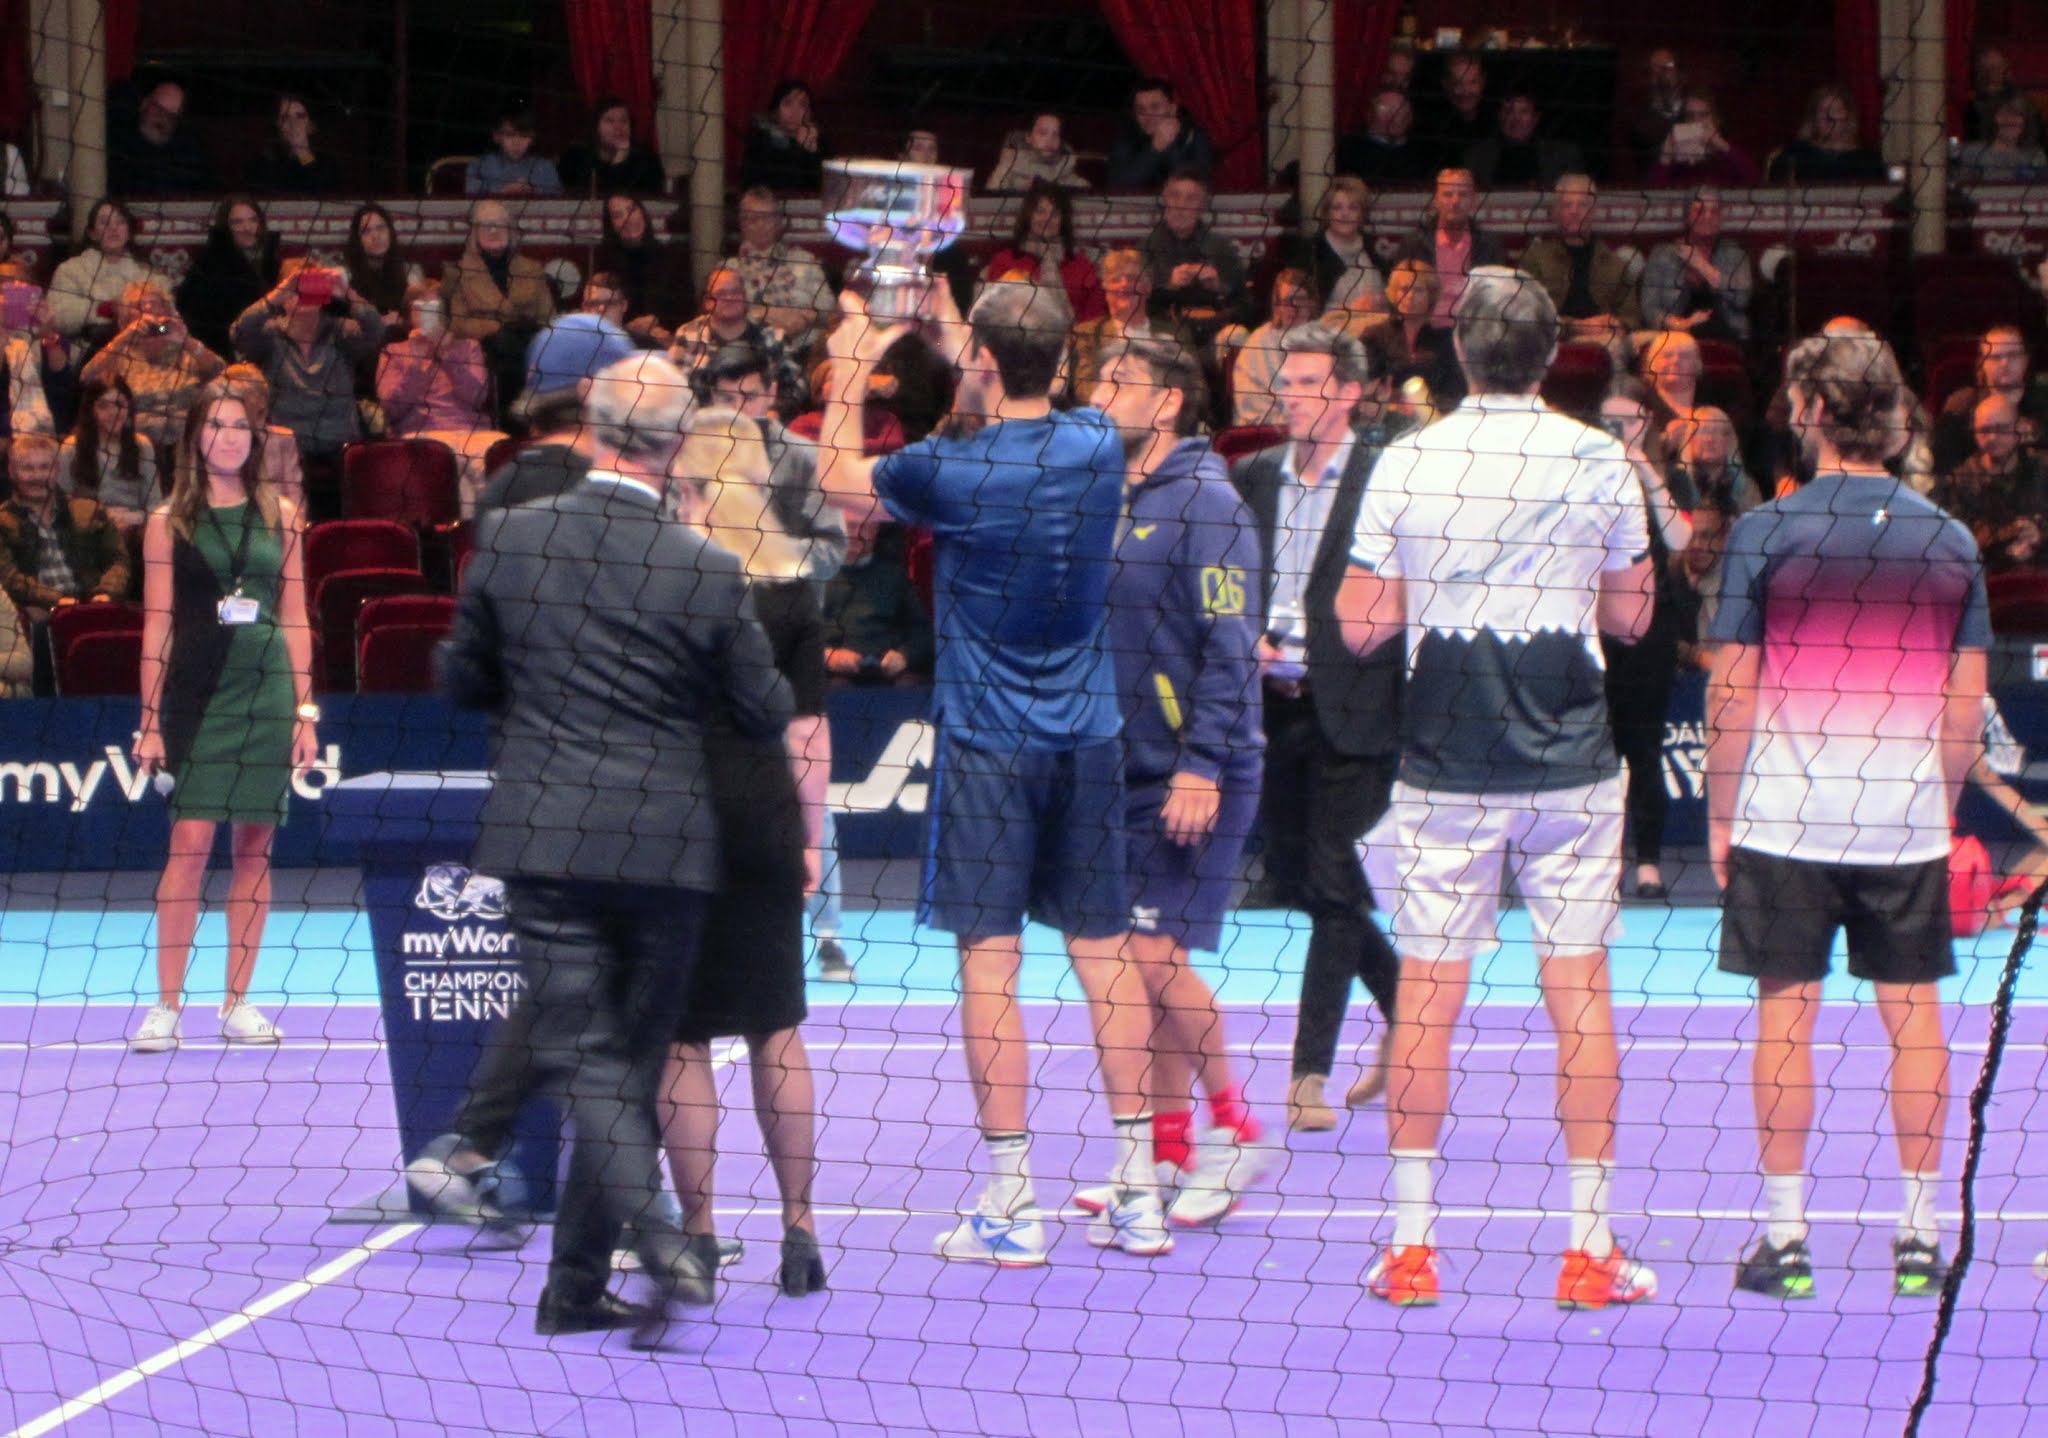 Greg Rusedski lifts the myWorld Champions Tennis trophy at the Royal Albert Hall